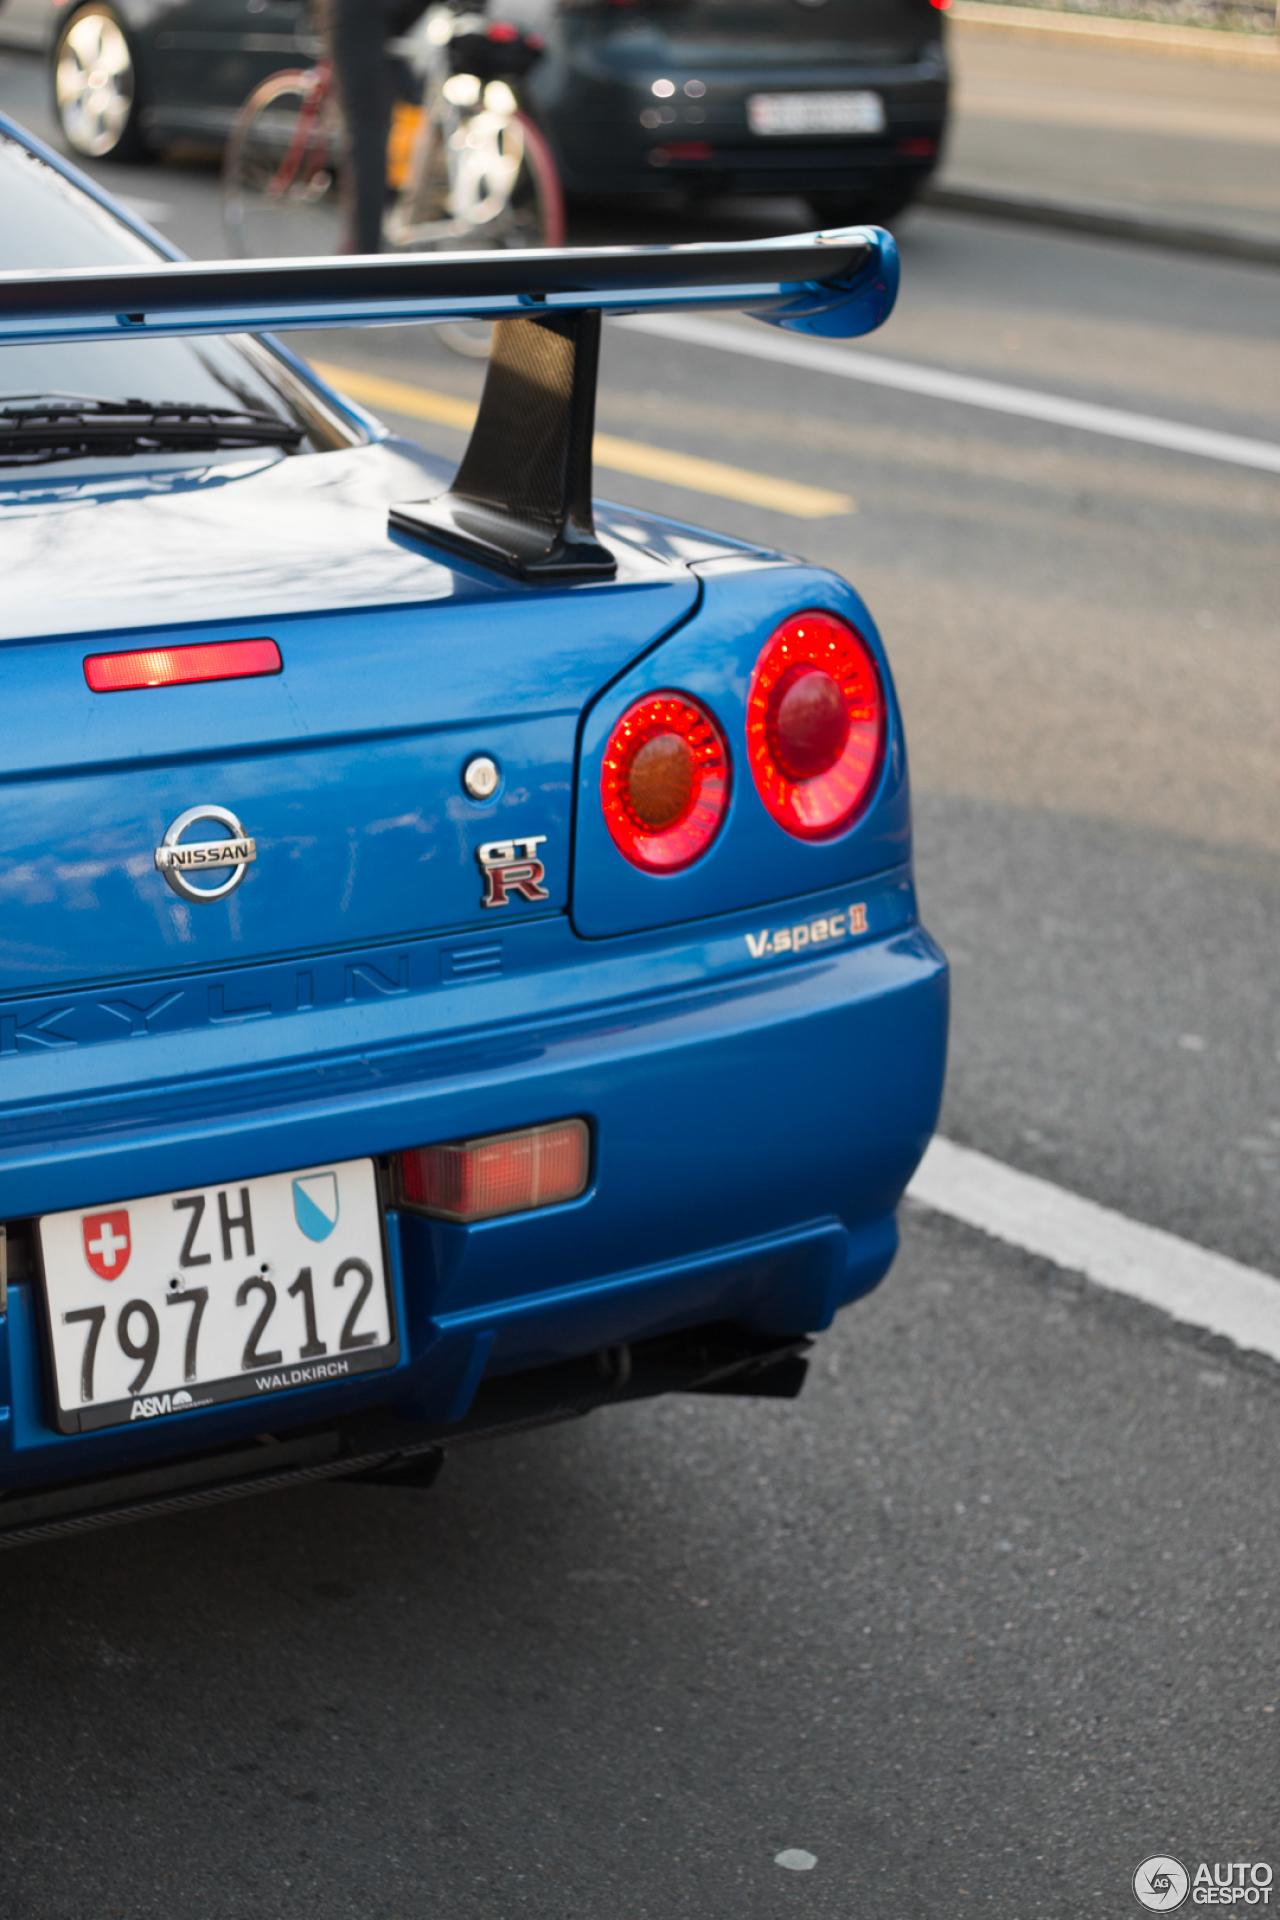 Skyline Gtr R34 For Sale >> Nissan Skyline R34 GT-R V-Spec II - 8 February 2016 - Autogespot